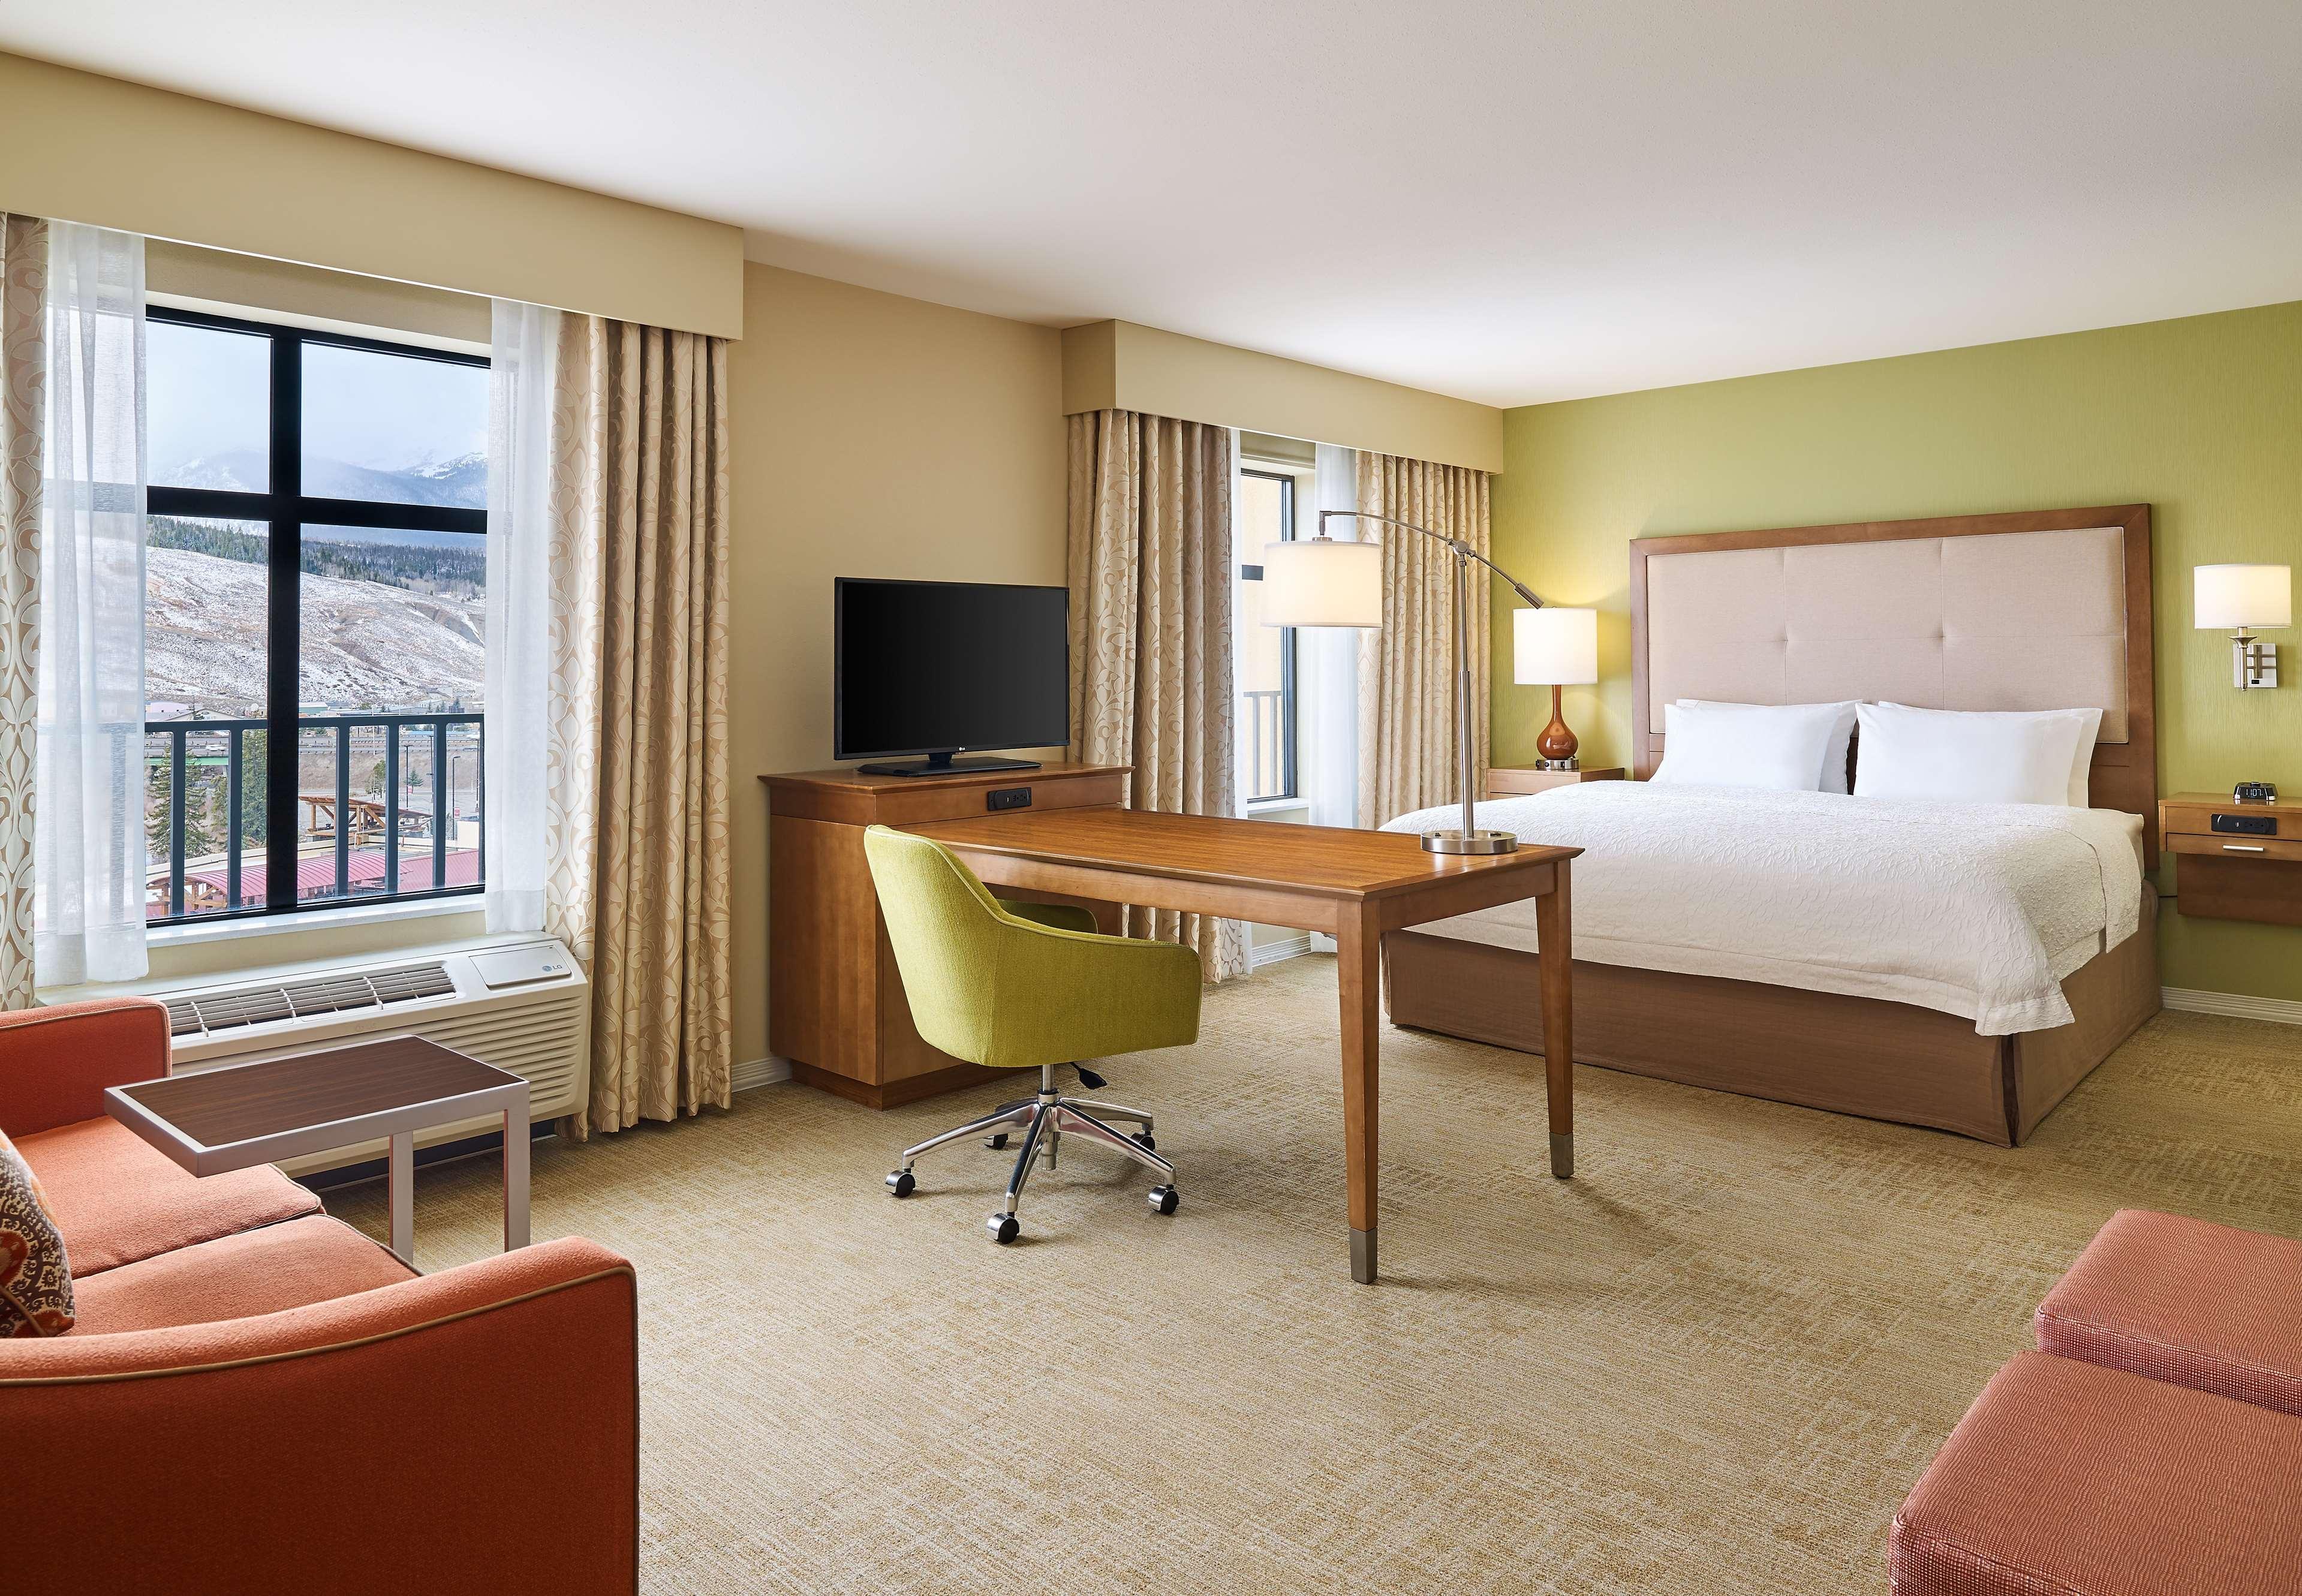 Hampton Inn & Suites Silverthorne image 27